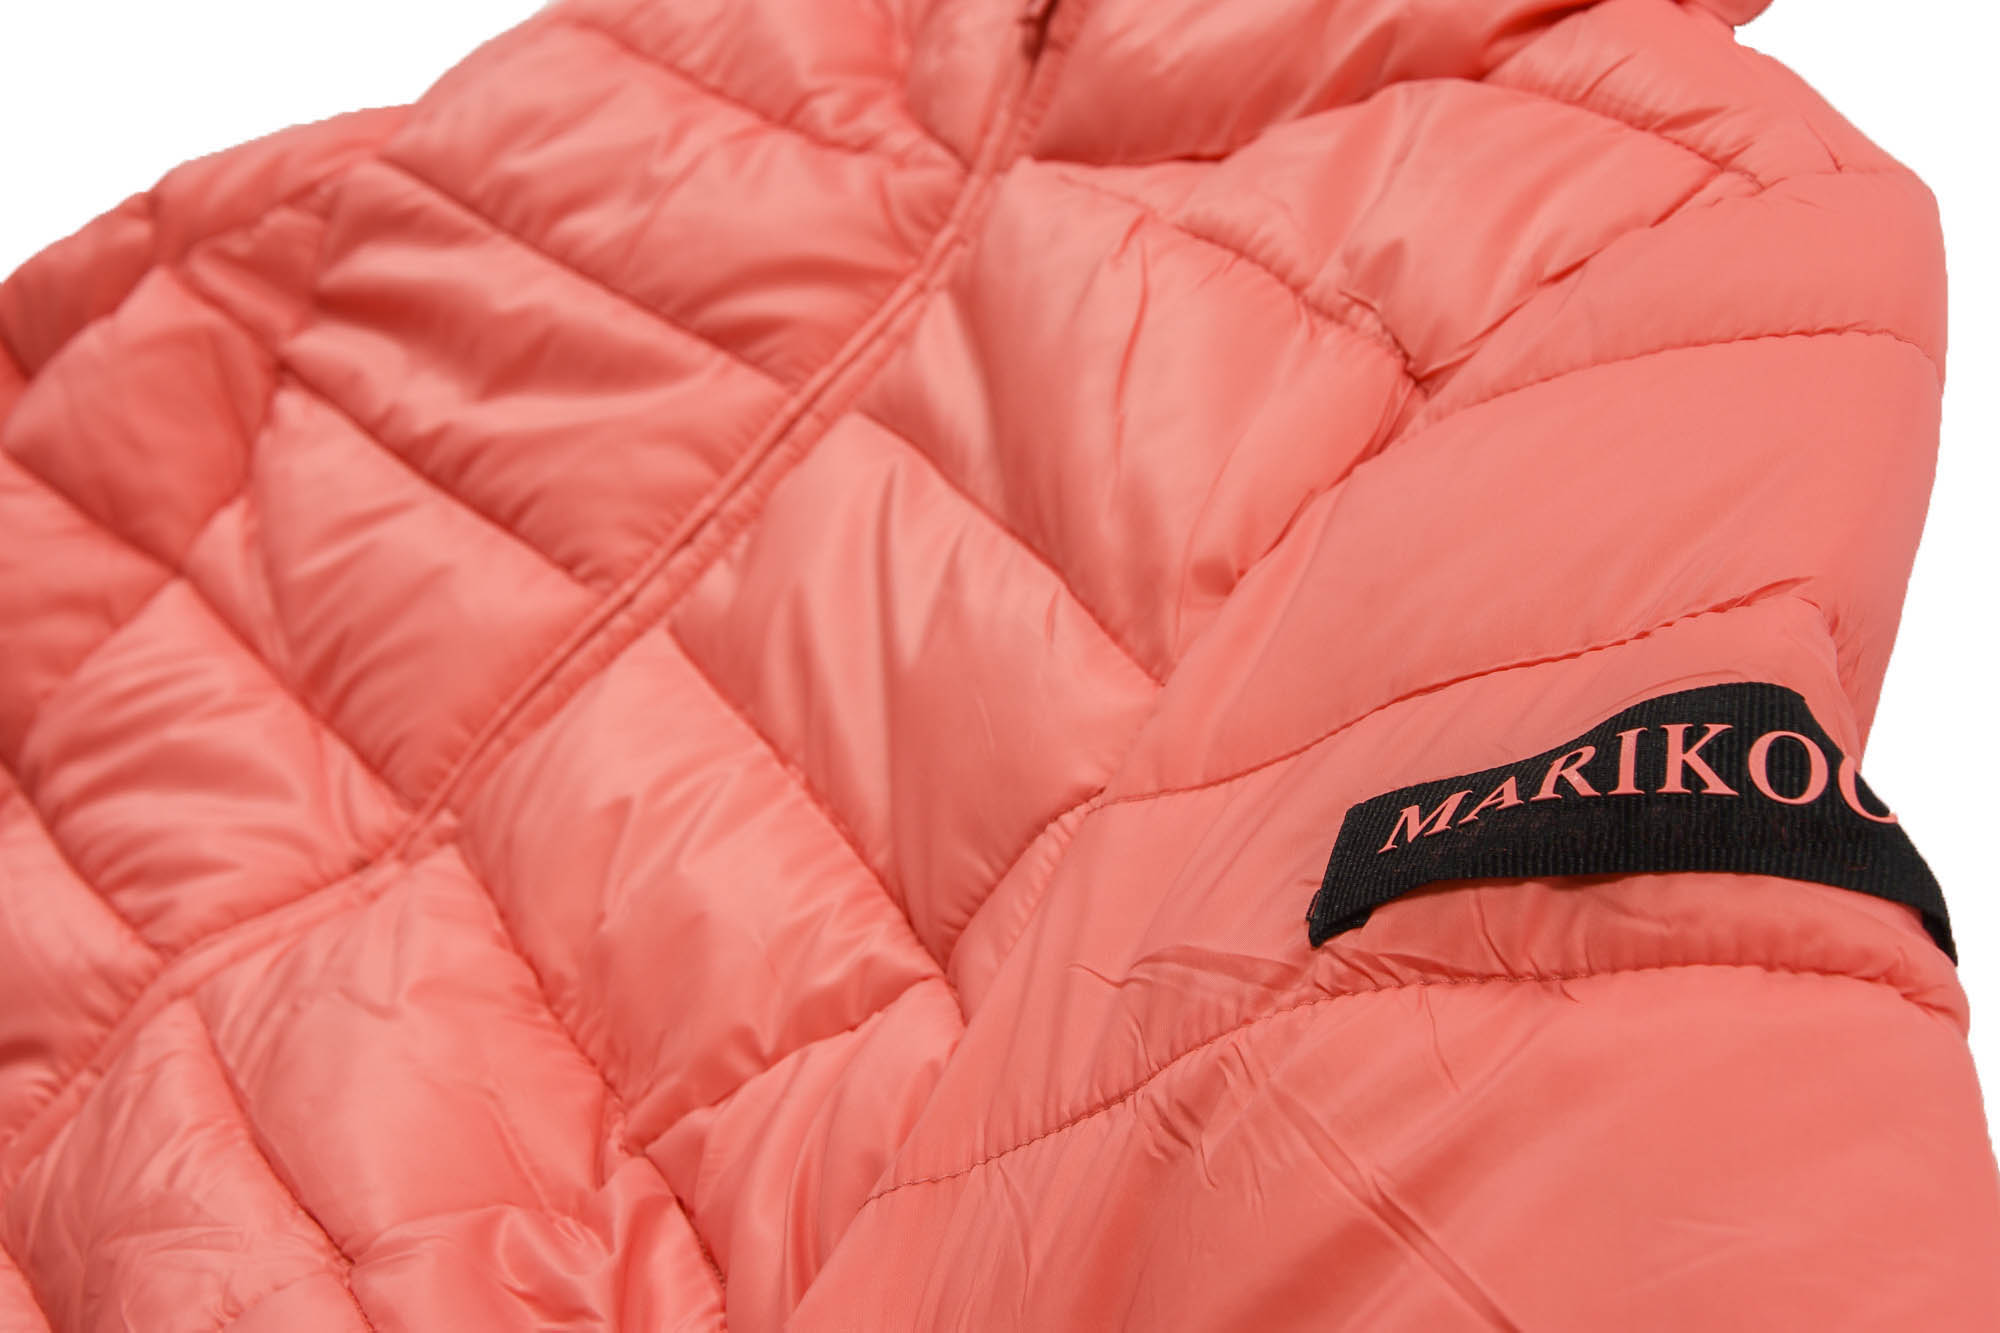 Marikoo-Lucy-Damen-Jacke-Steppjacke-Ubergangsjacke-gesteppt-Stepp-NEU-B651 Indexbild 39